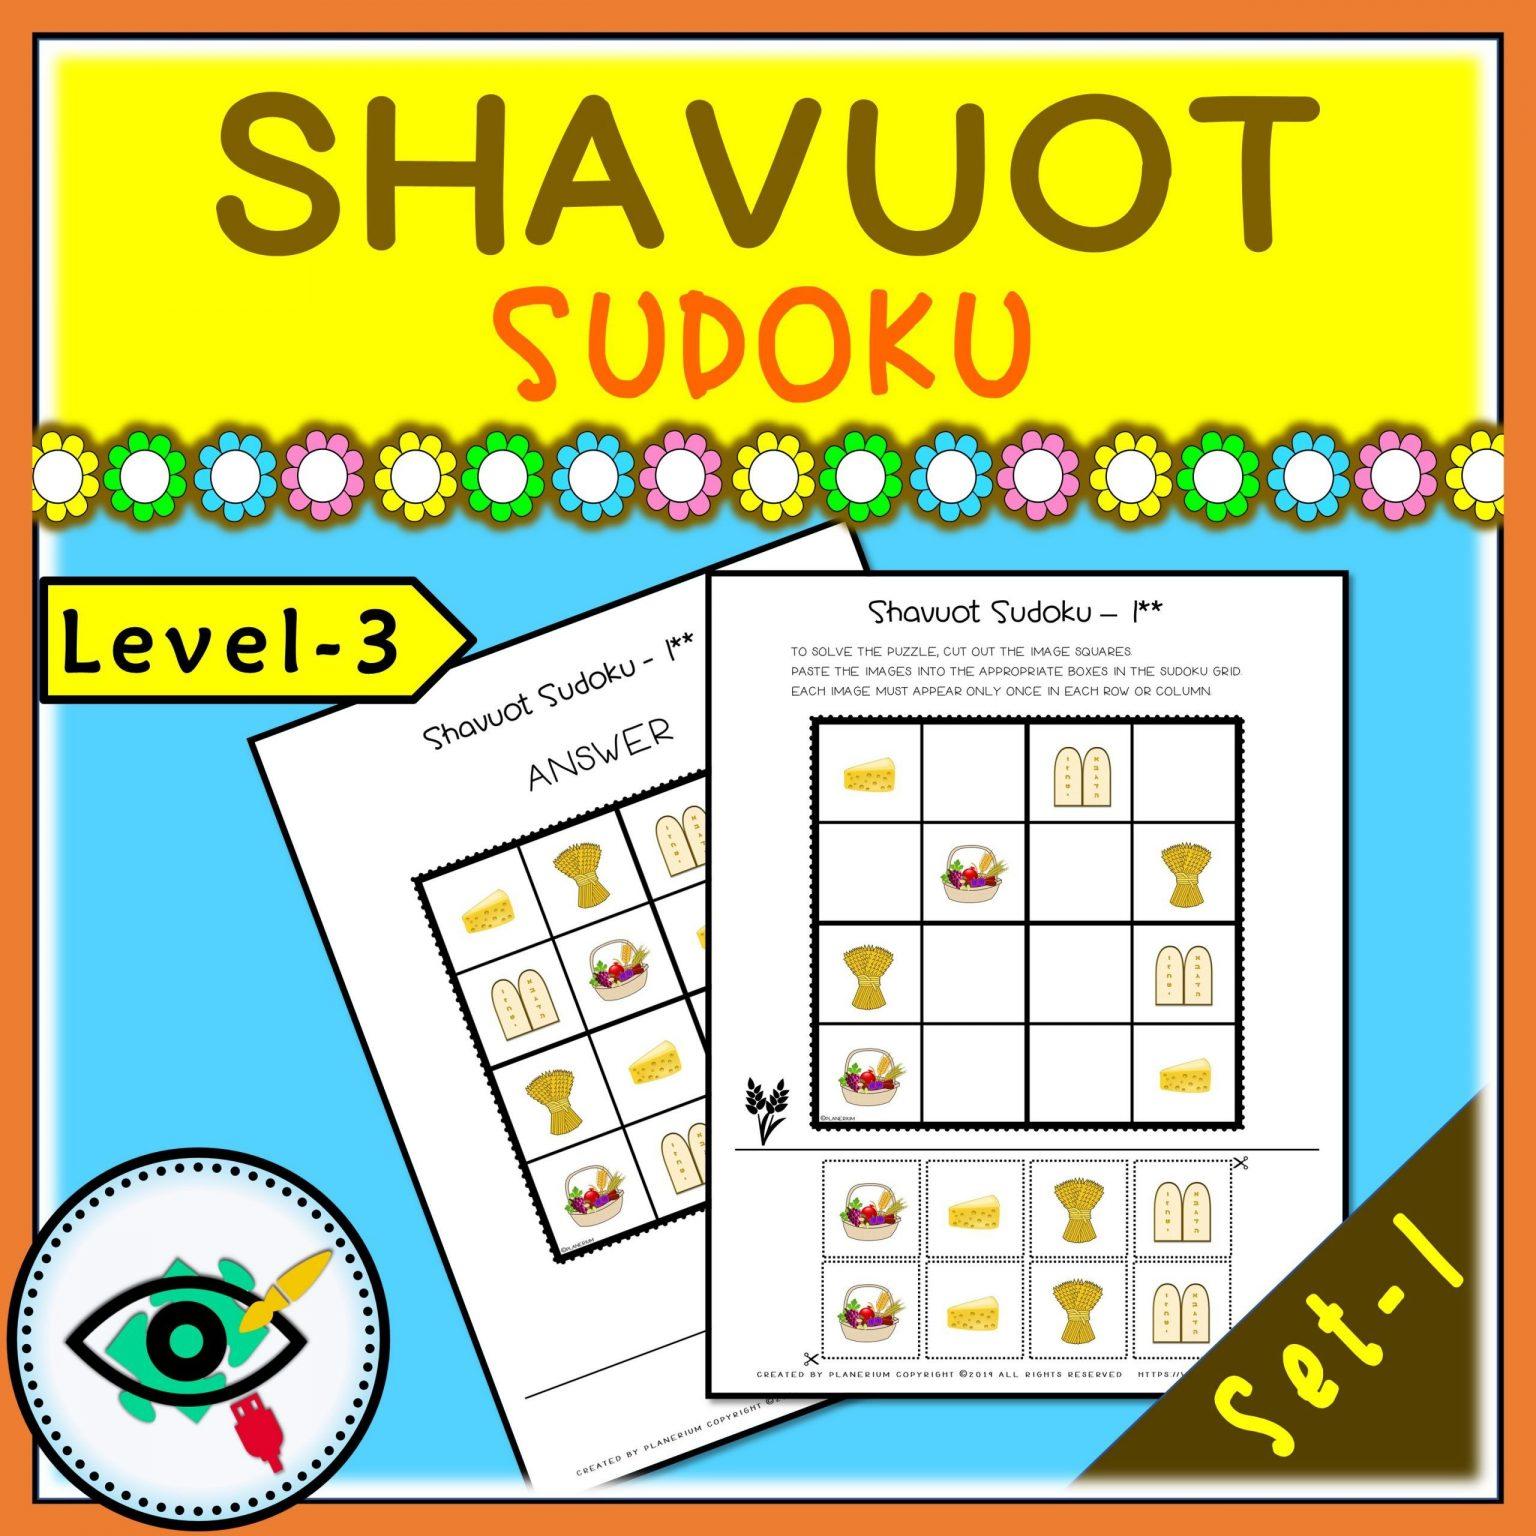 Shavuot - Sudoku Puzzle Game - Title 3